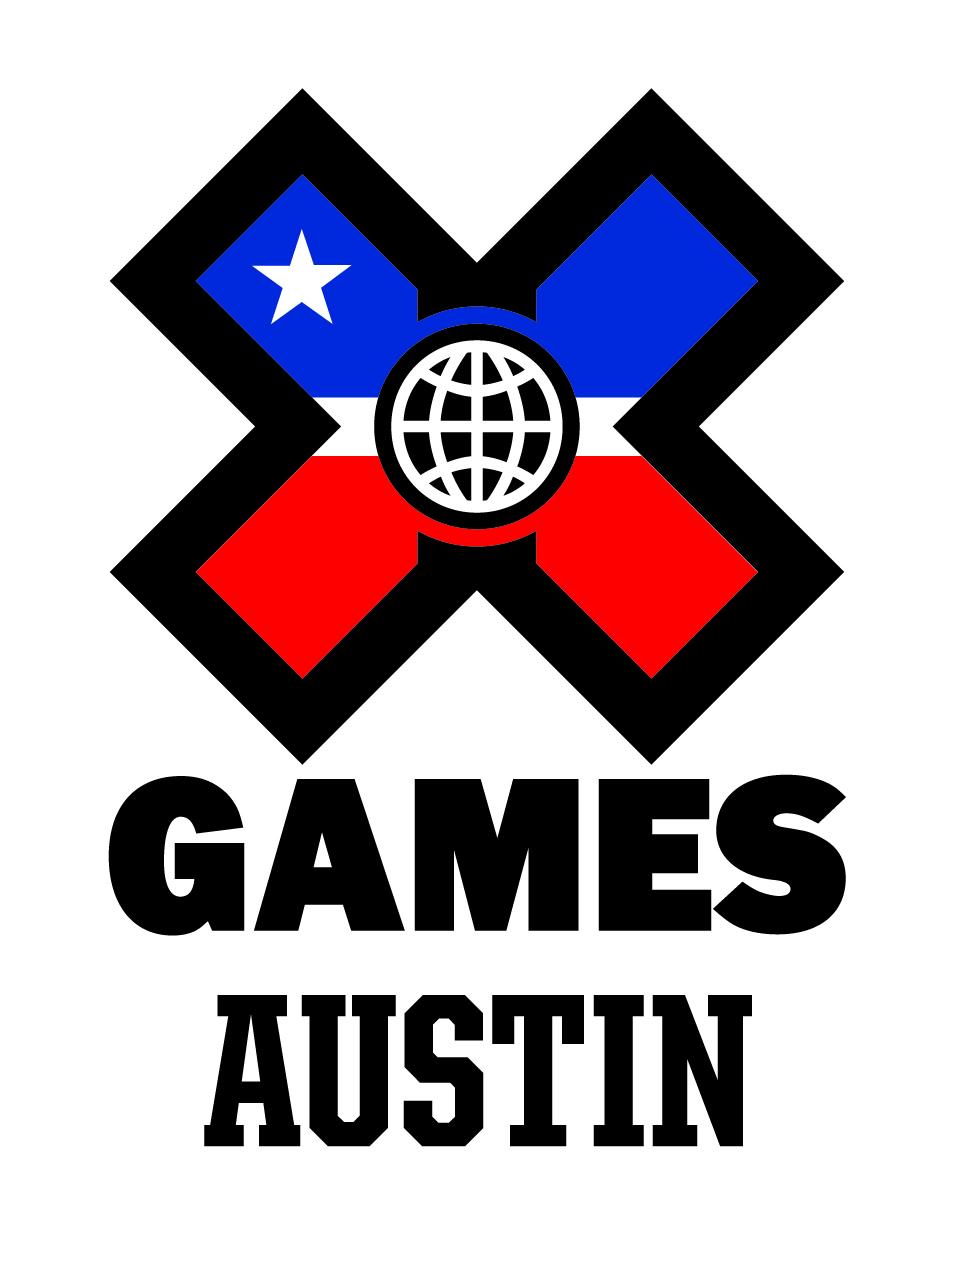 X-Games-Austin-LOGO.jpg